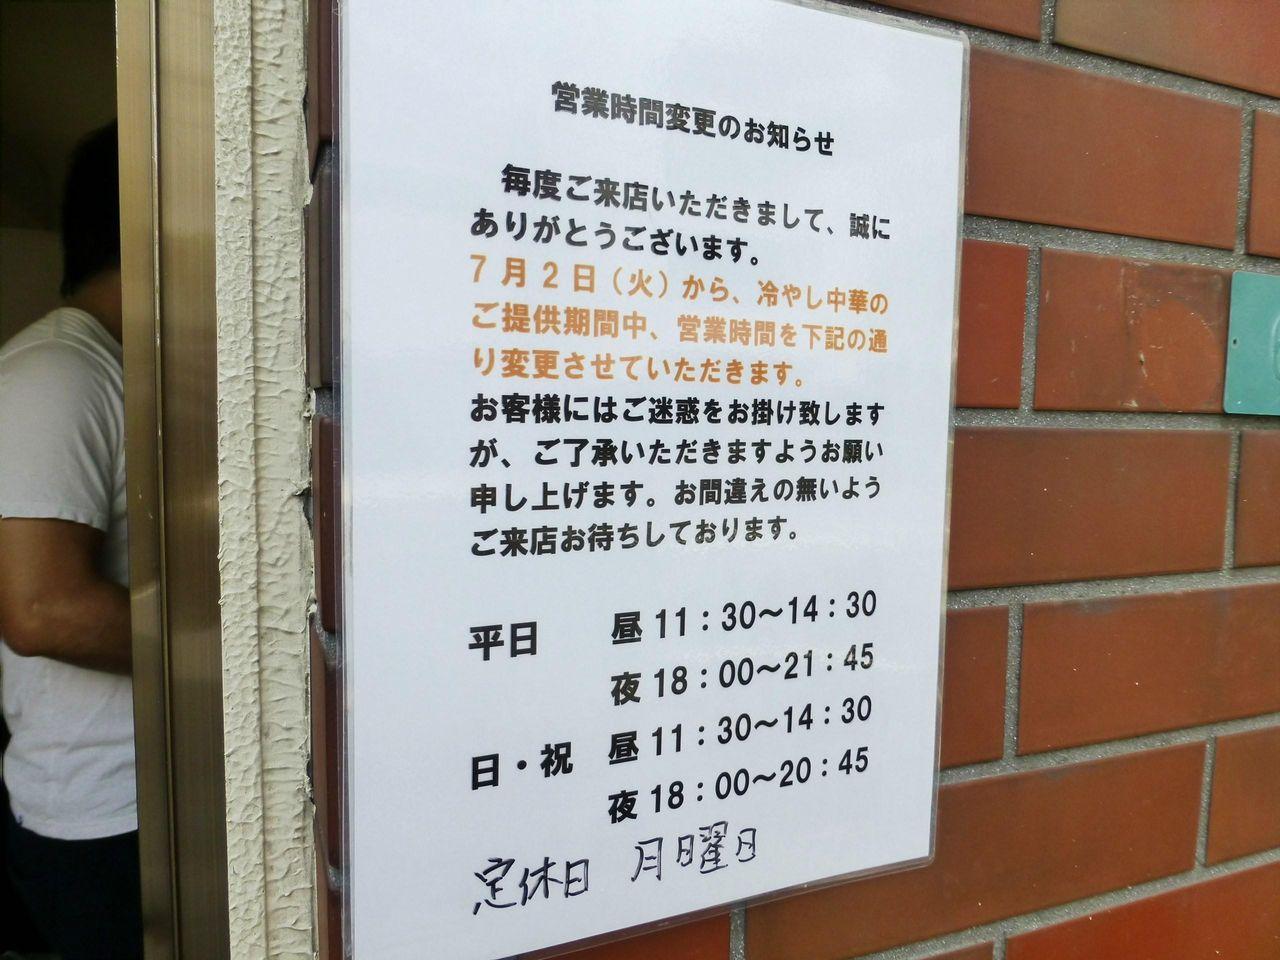 営業時間の変更(25年8月現在)